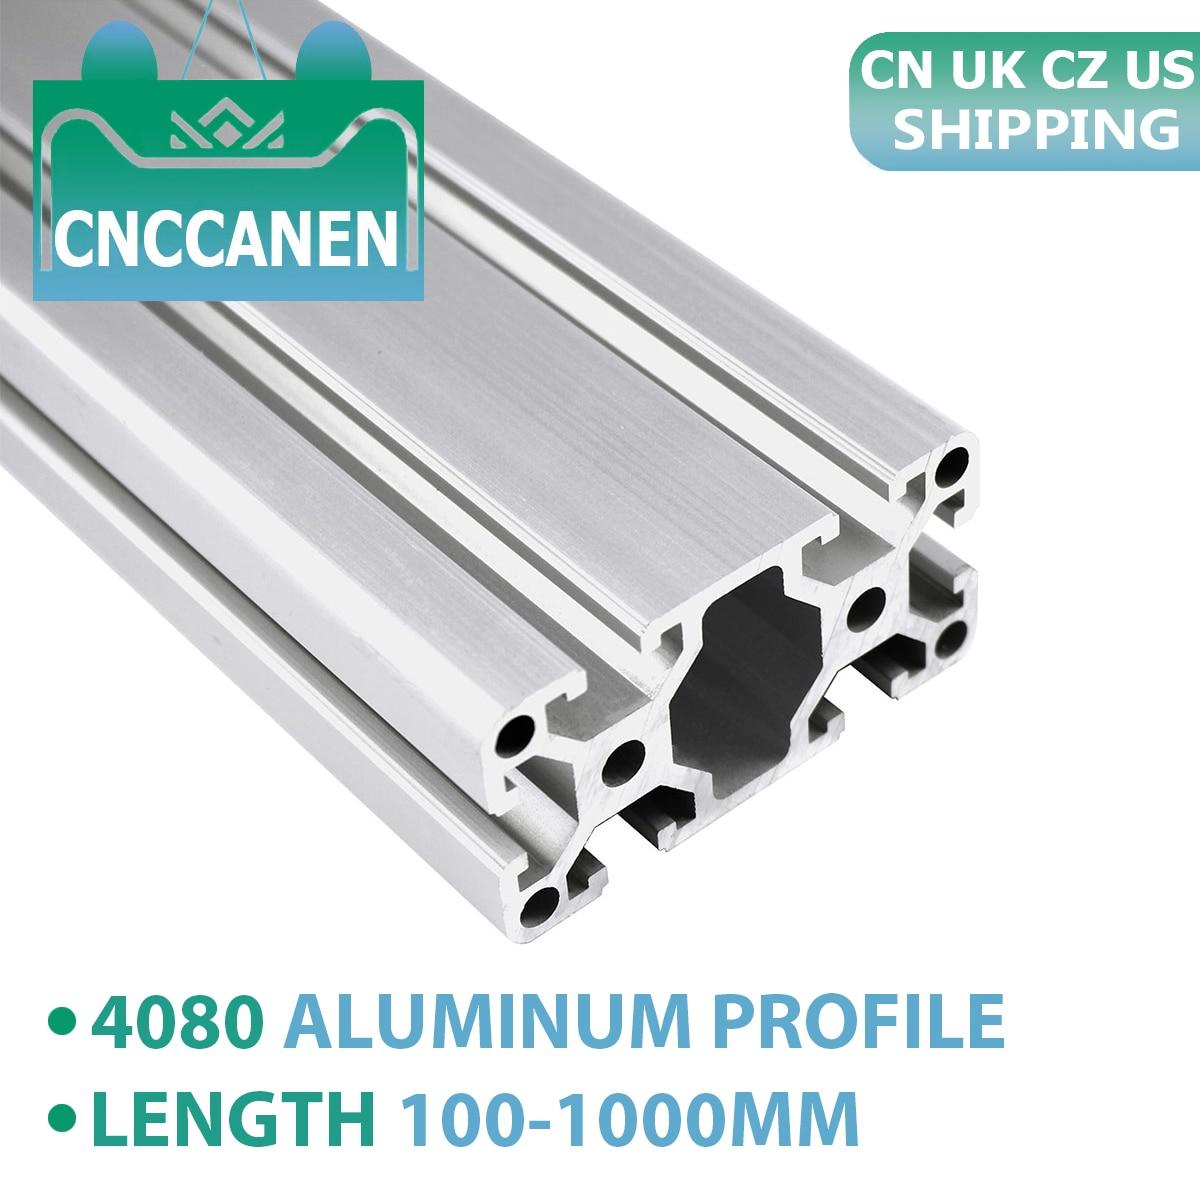 4080 Aluminum Profile Extrusion European Standard Anodized Linear Rail Aluminum Extrusion 4080 Profile For CNC 3D Printer Parts